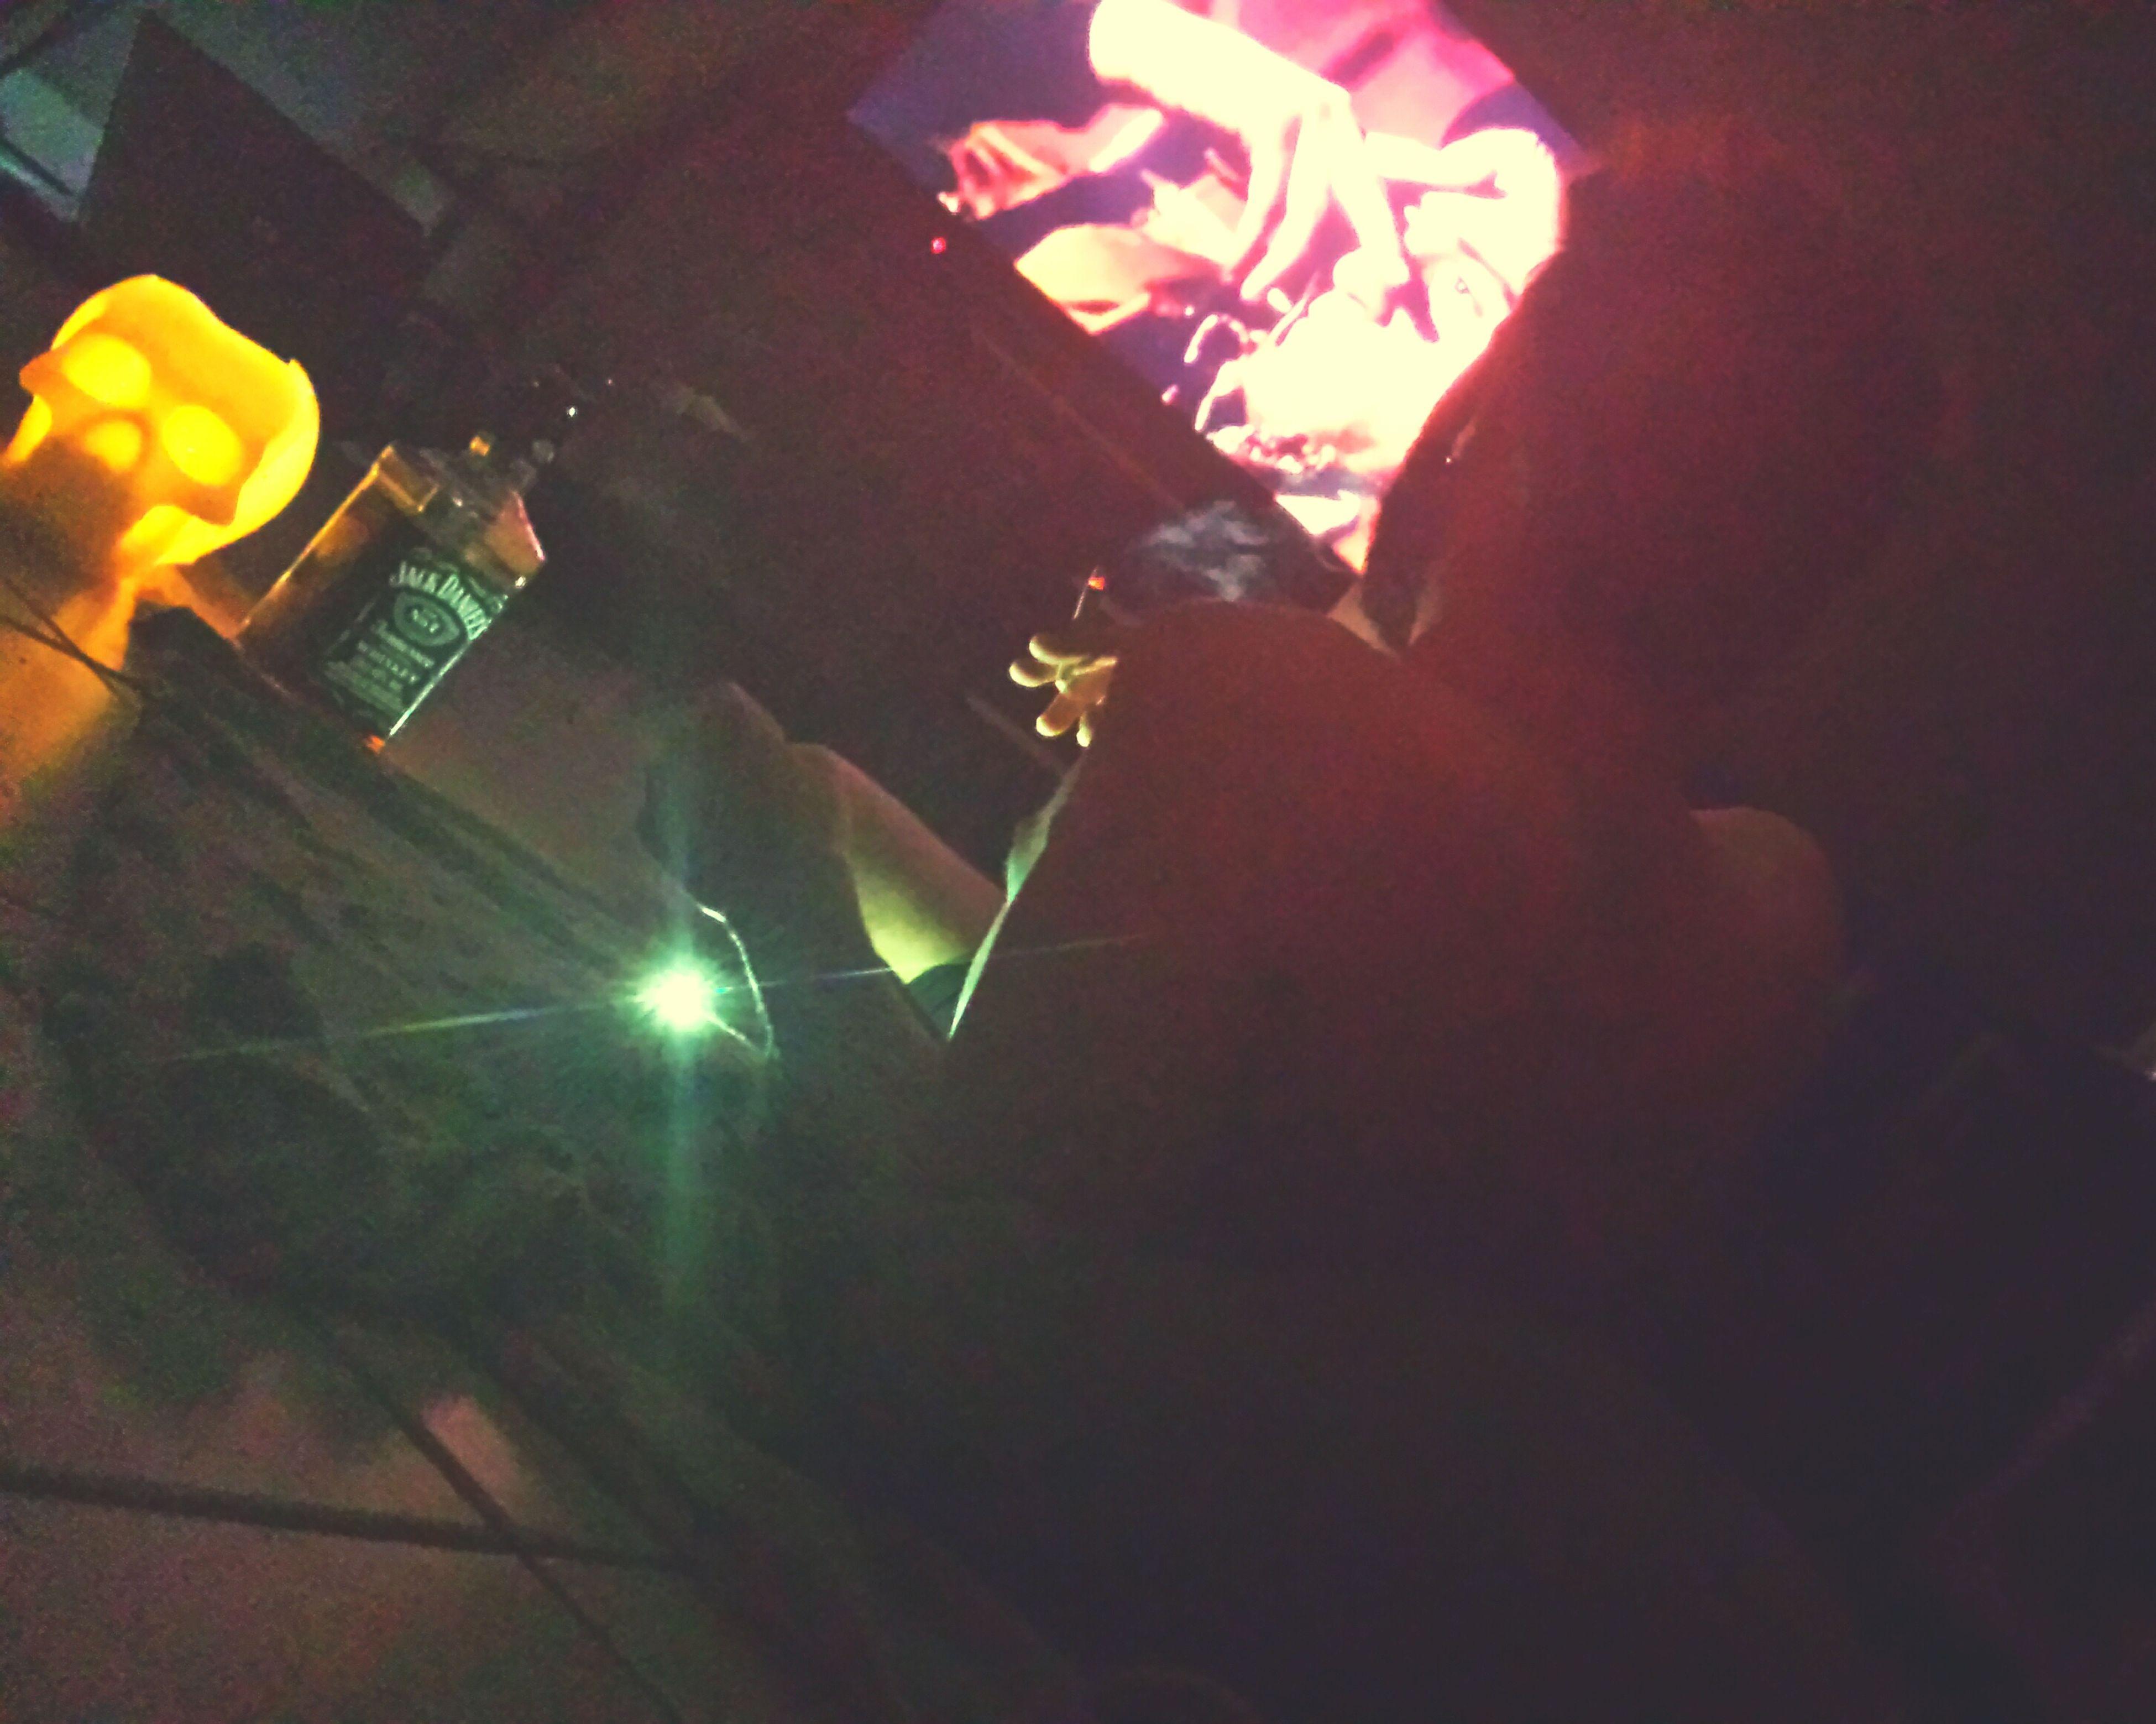 illuminated, indoors, night, lifestyles, lighting equipment, celebration, leisure activity, person, men, light - natural phenomenon, high angle view, unrecognizable person, sunlight, decoration, home interior, built structure, architecture